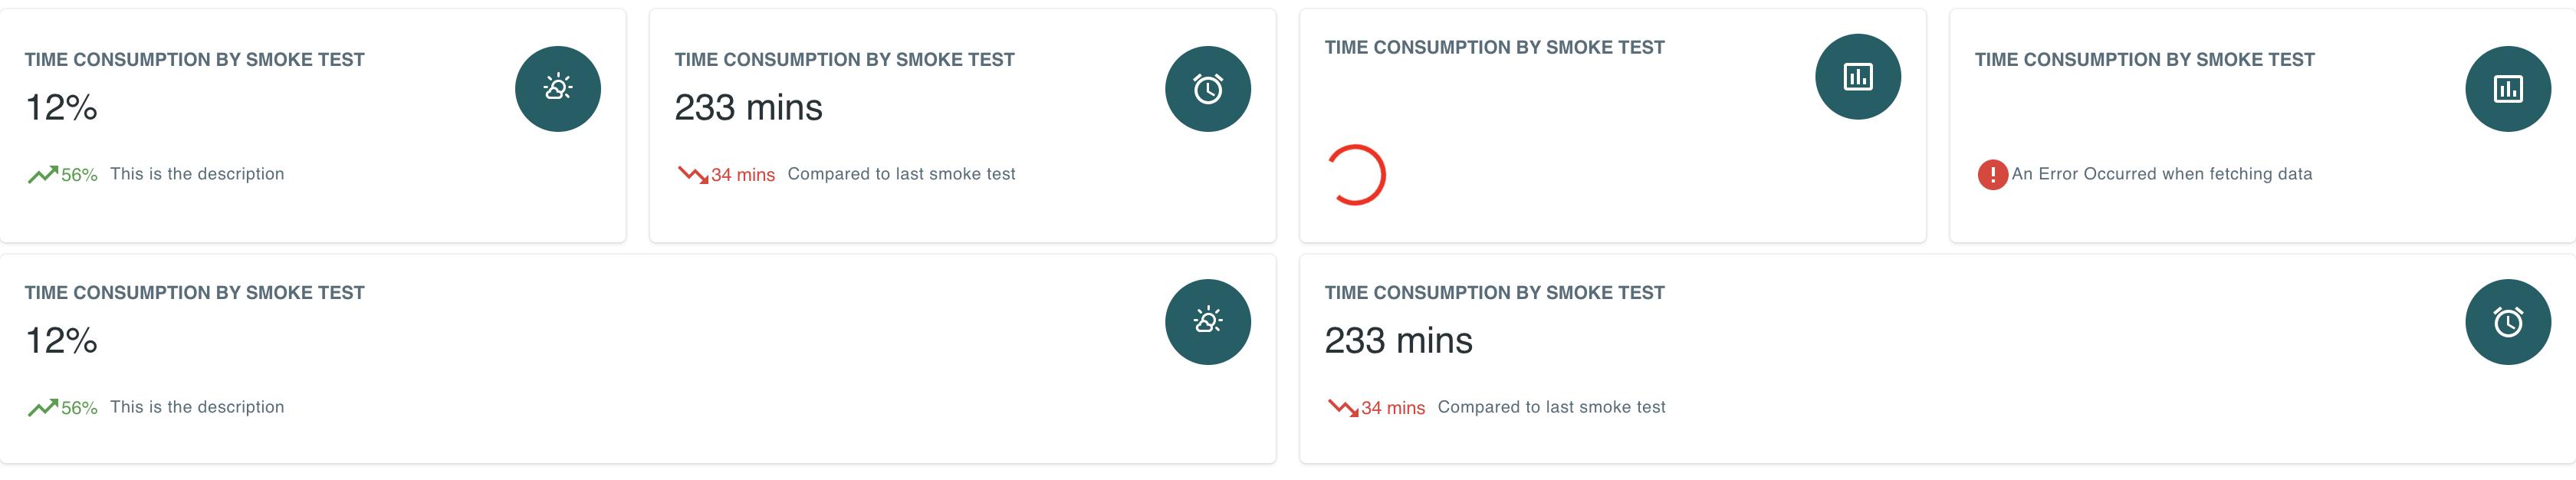 React Metric Card Usage on a Dashboard